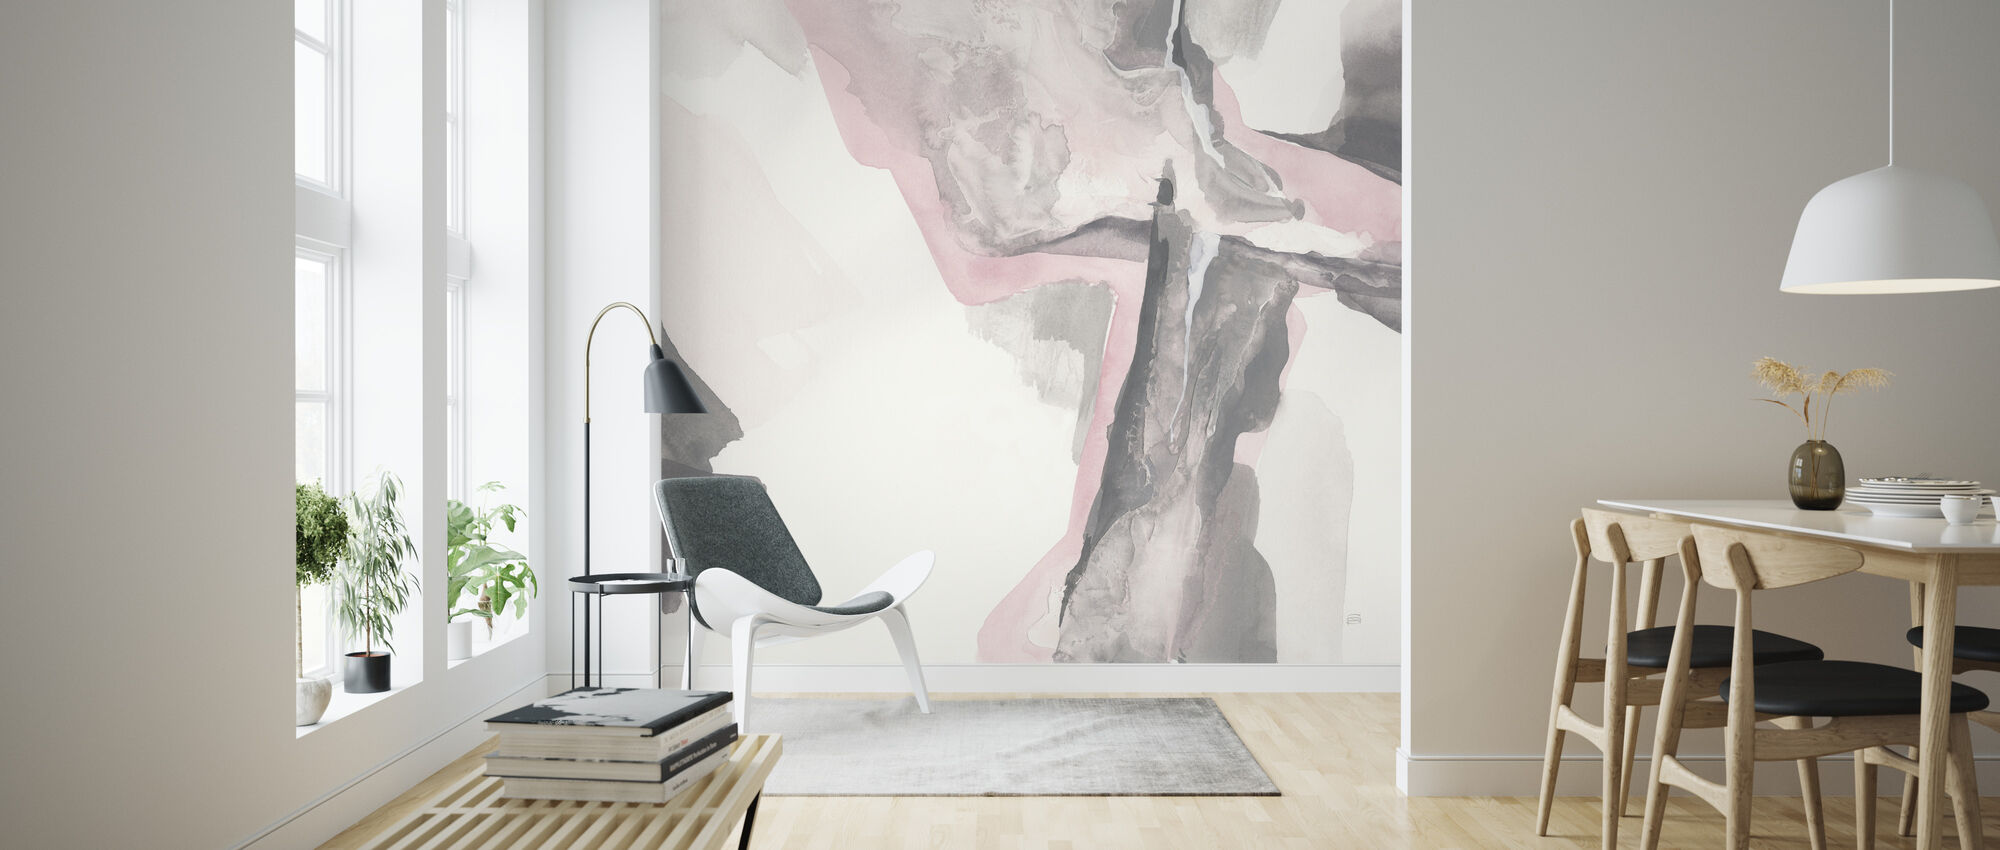 Blushing Gray - Wallpaper - Living Room